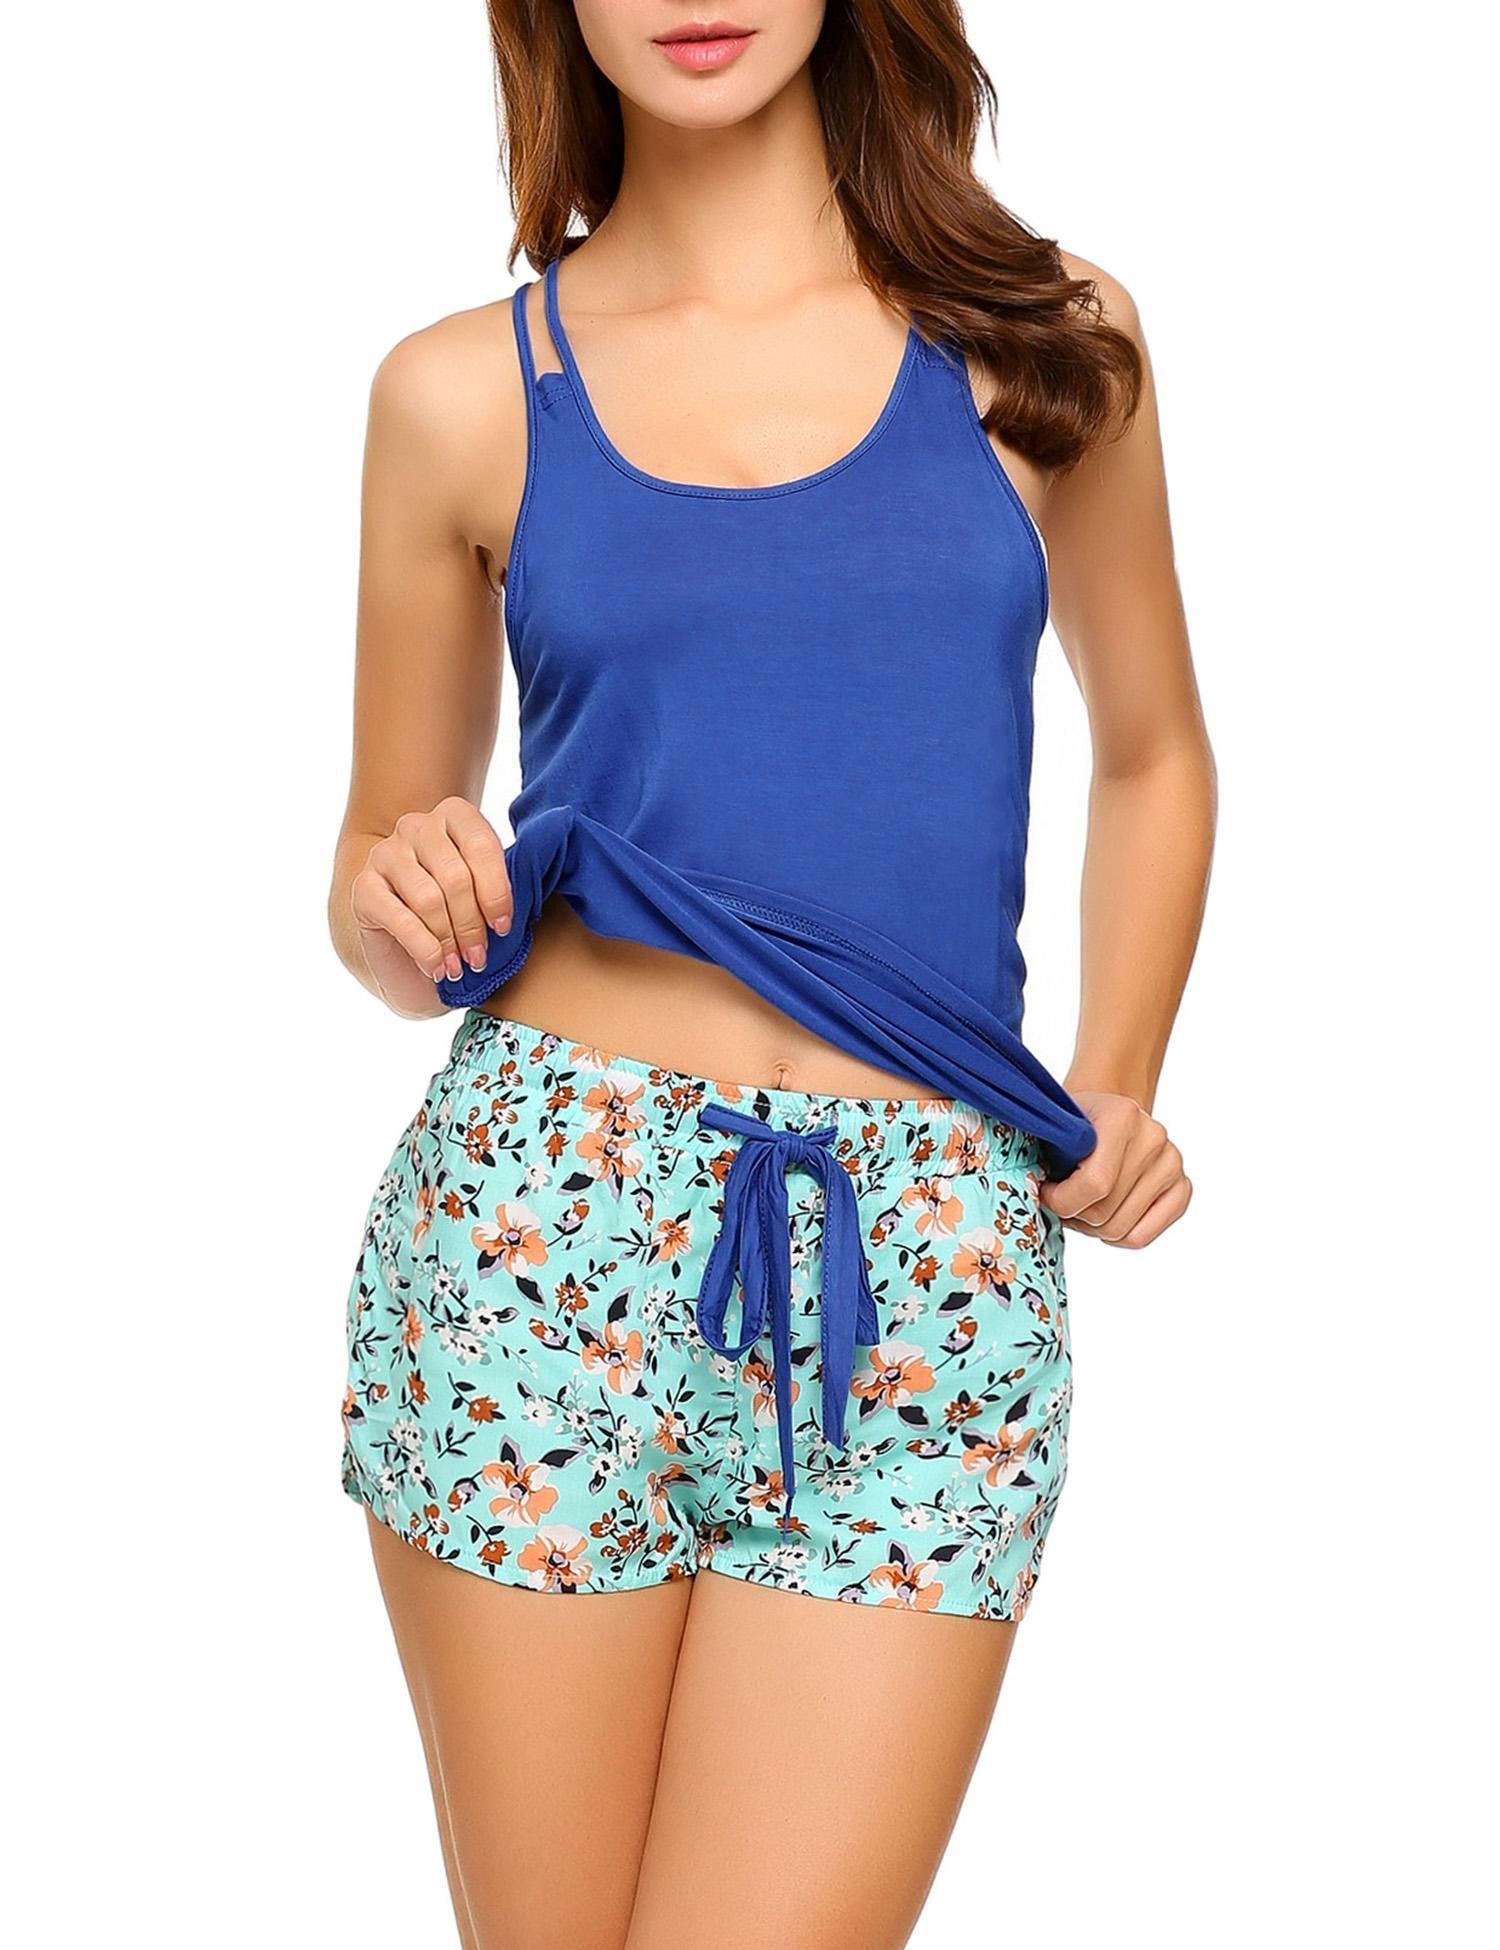 Declare Women's Sexy Sleeveless Pajamas Set Sexy Camisole Sleepwear Nightgowns(Blue M)